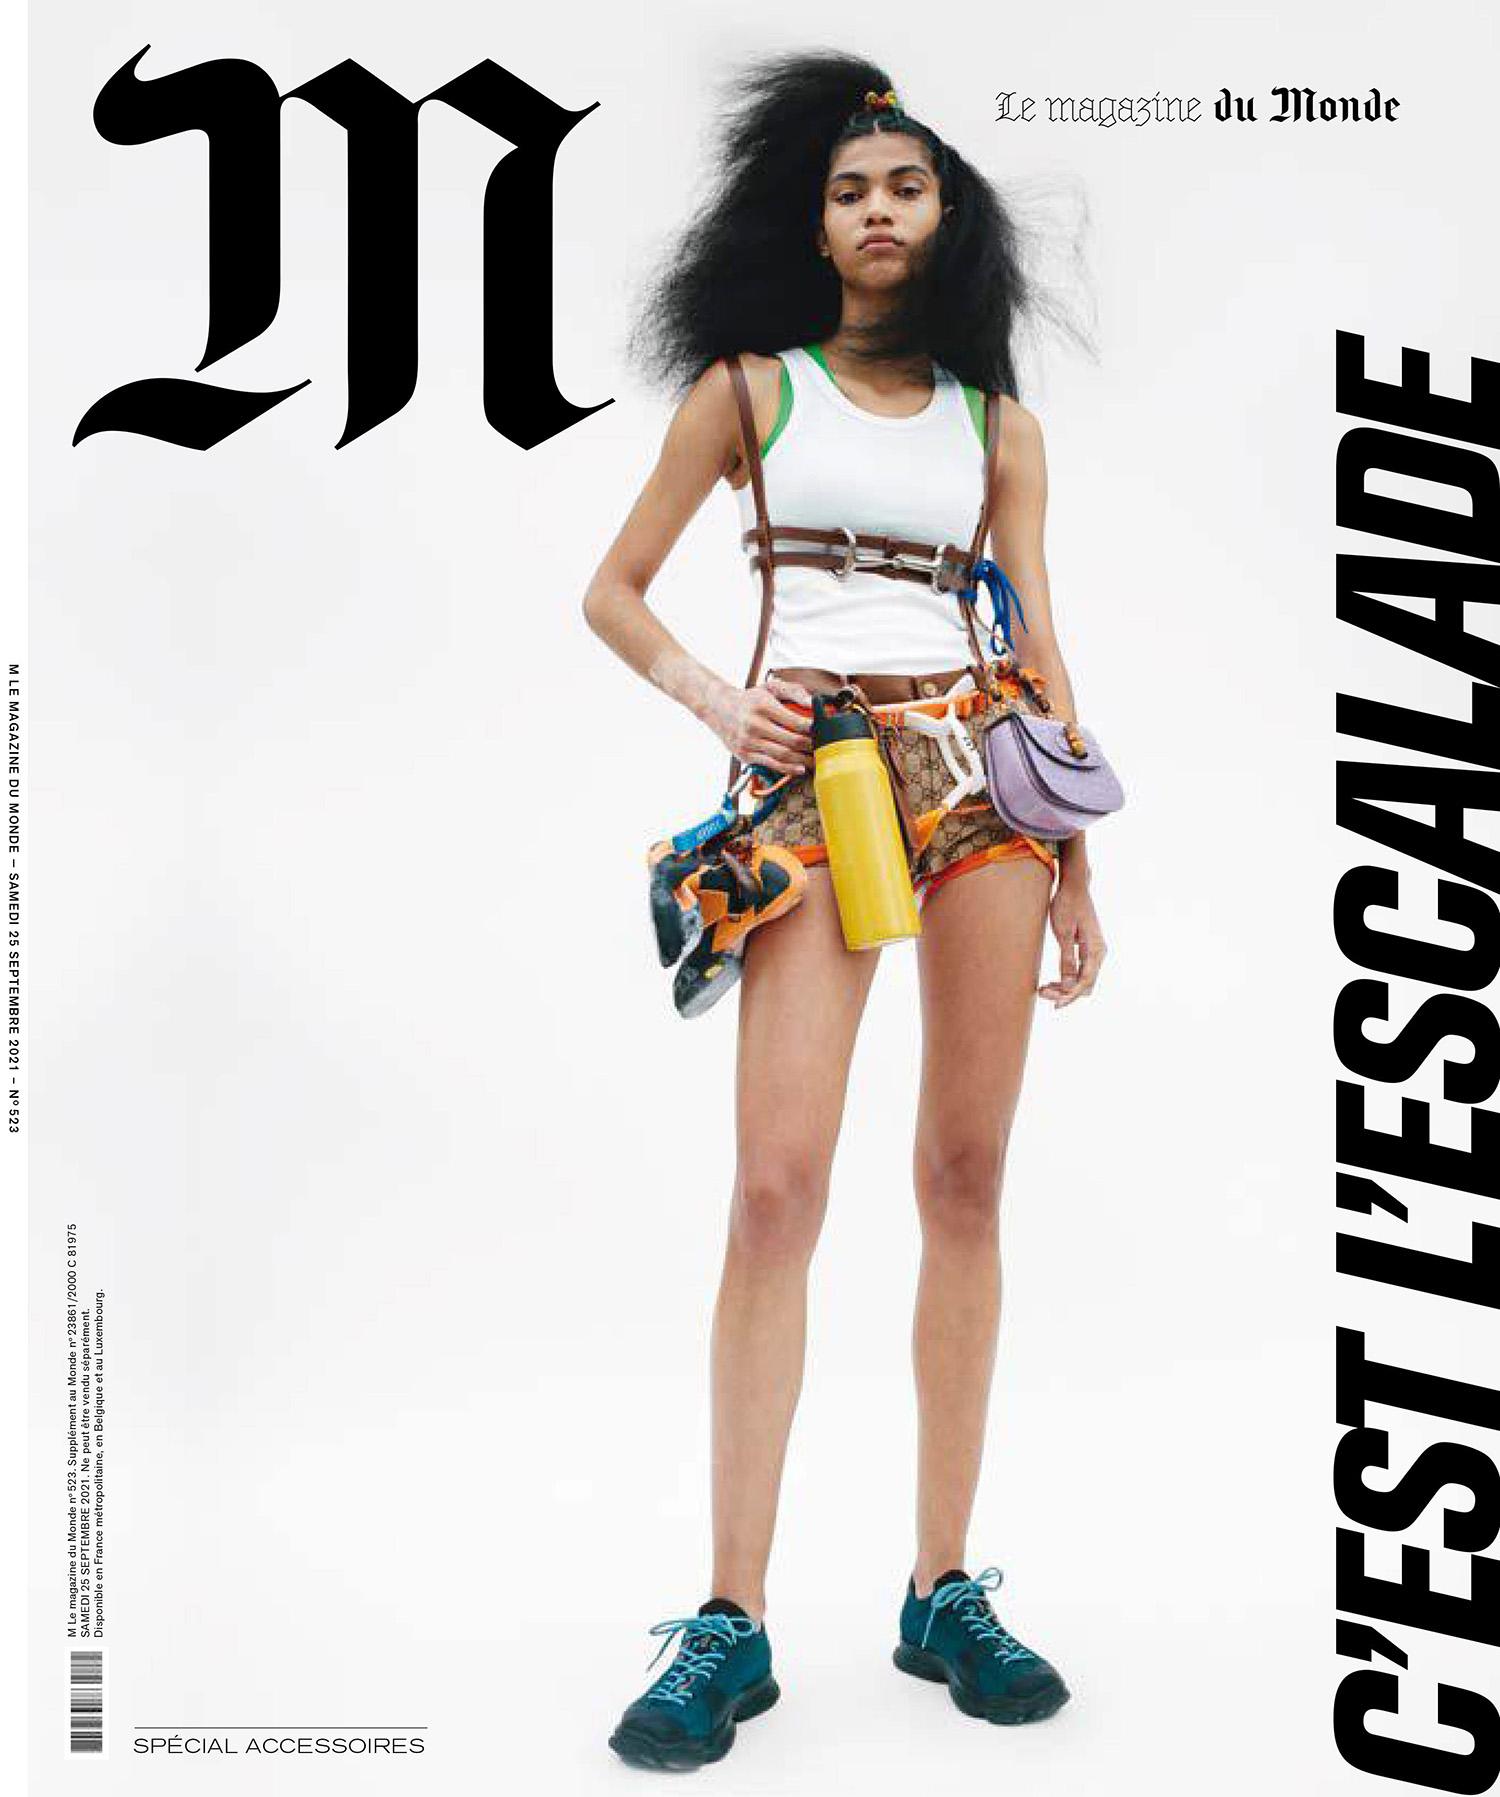 M Le magazine du Monde September 25th, 2021 covers by Tim Elkaïm